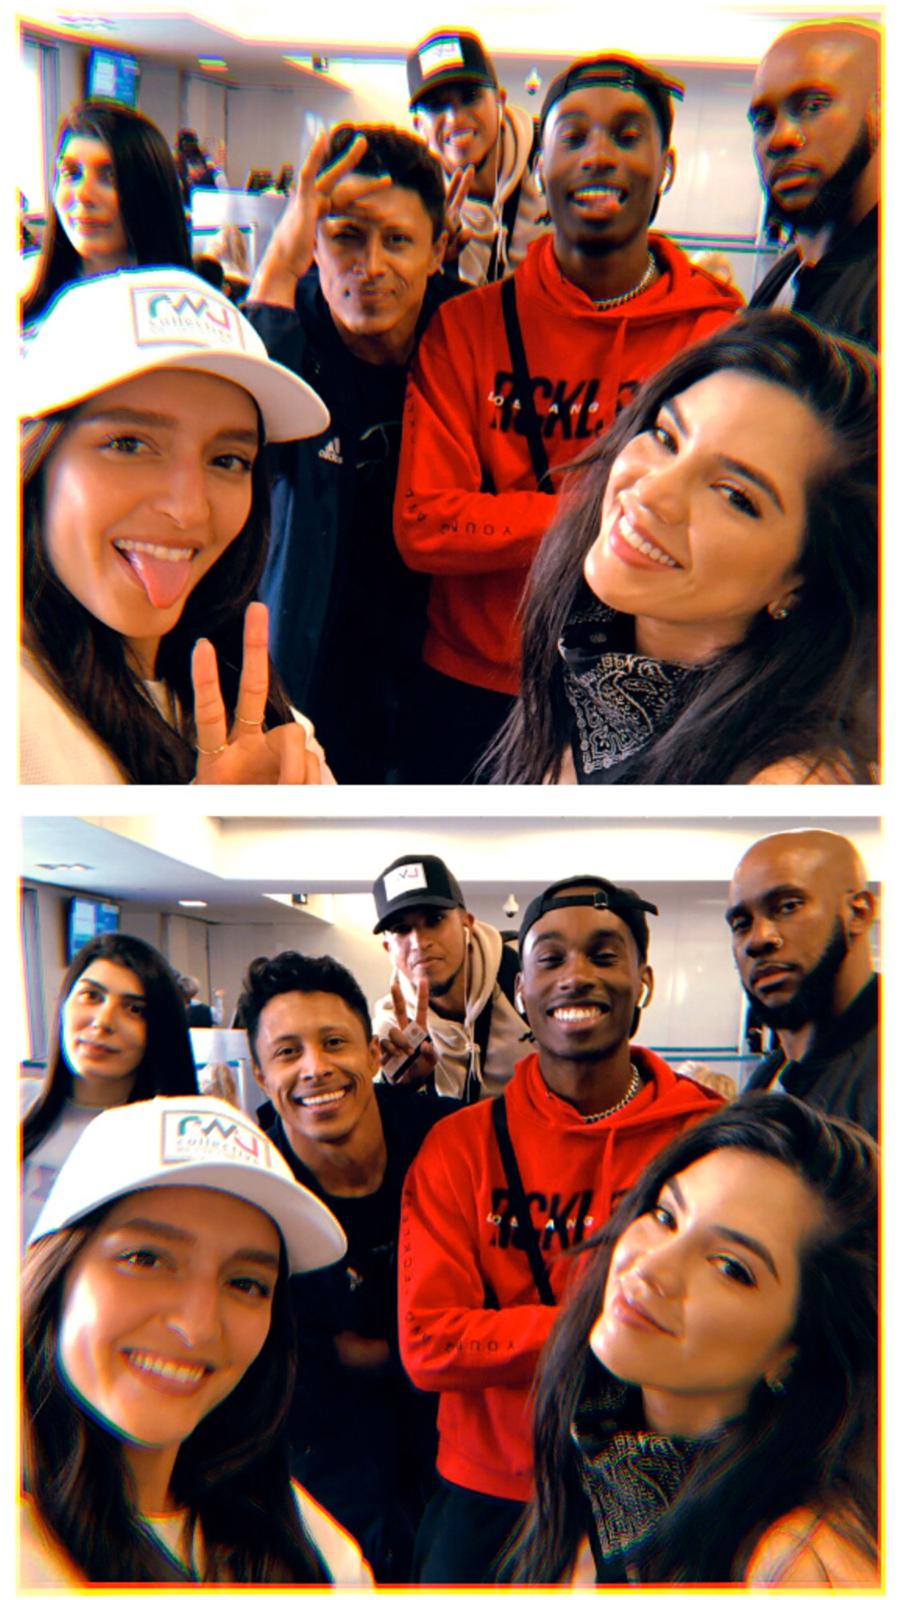 MC Ross B, DJ Volume and RWU Dancers take over Chicago